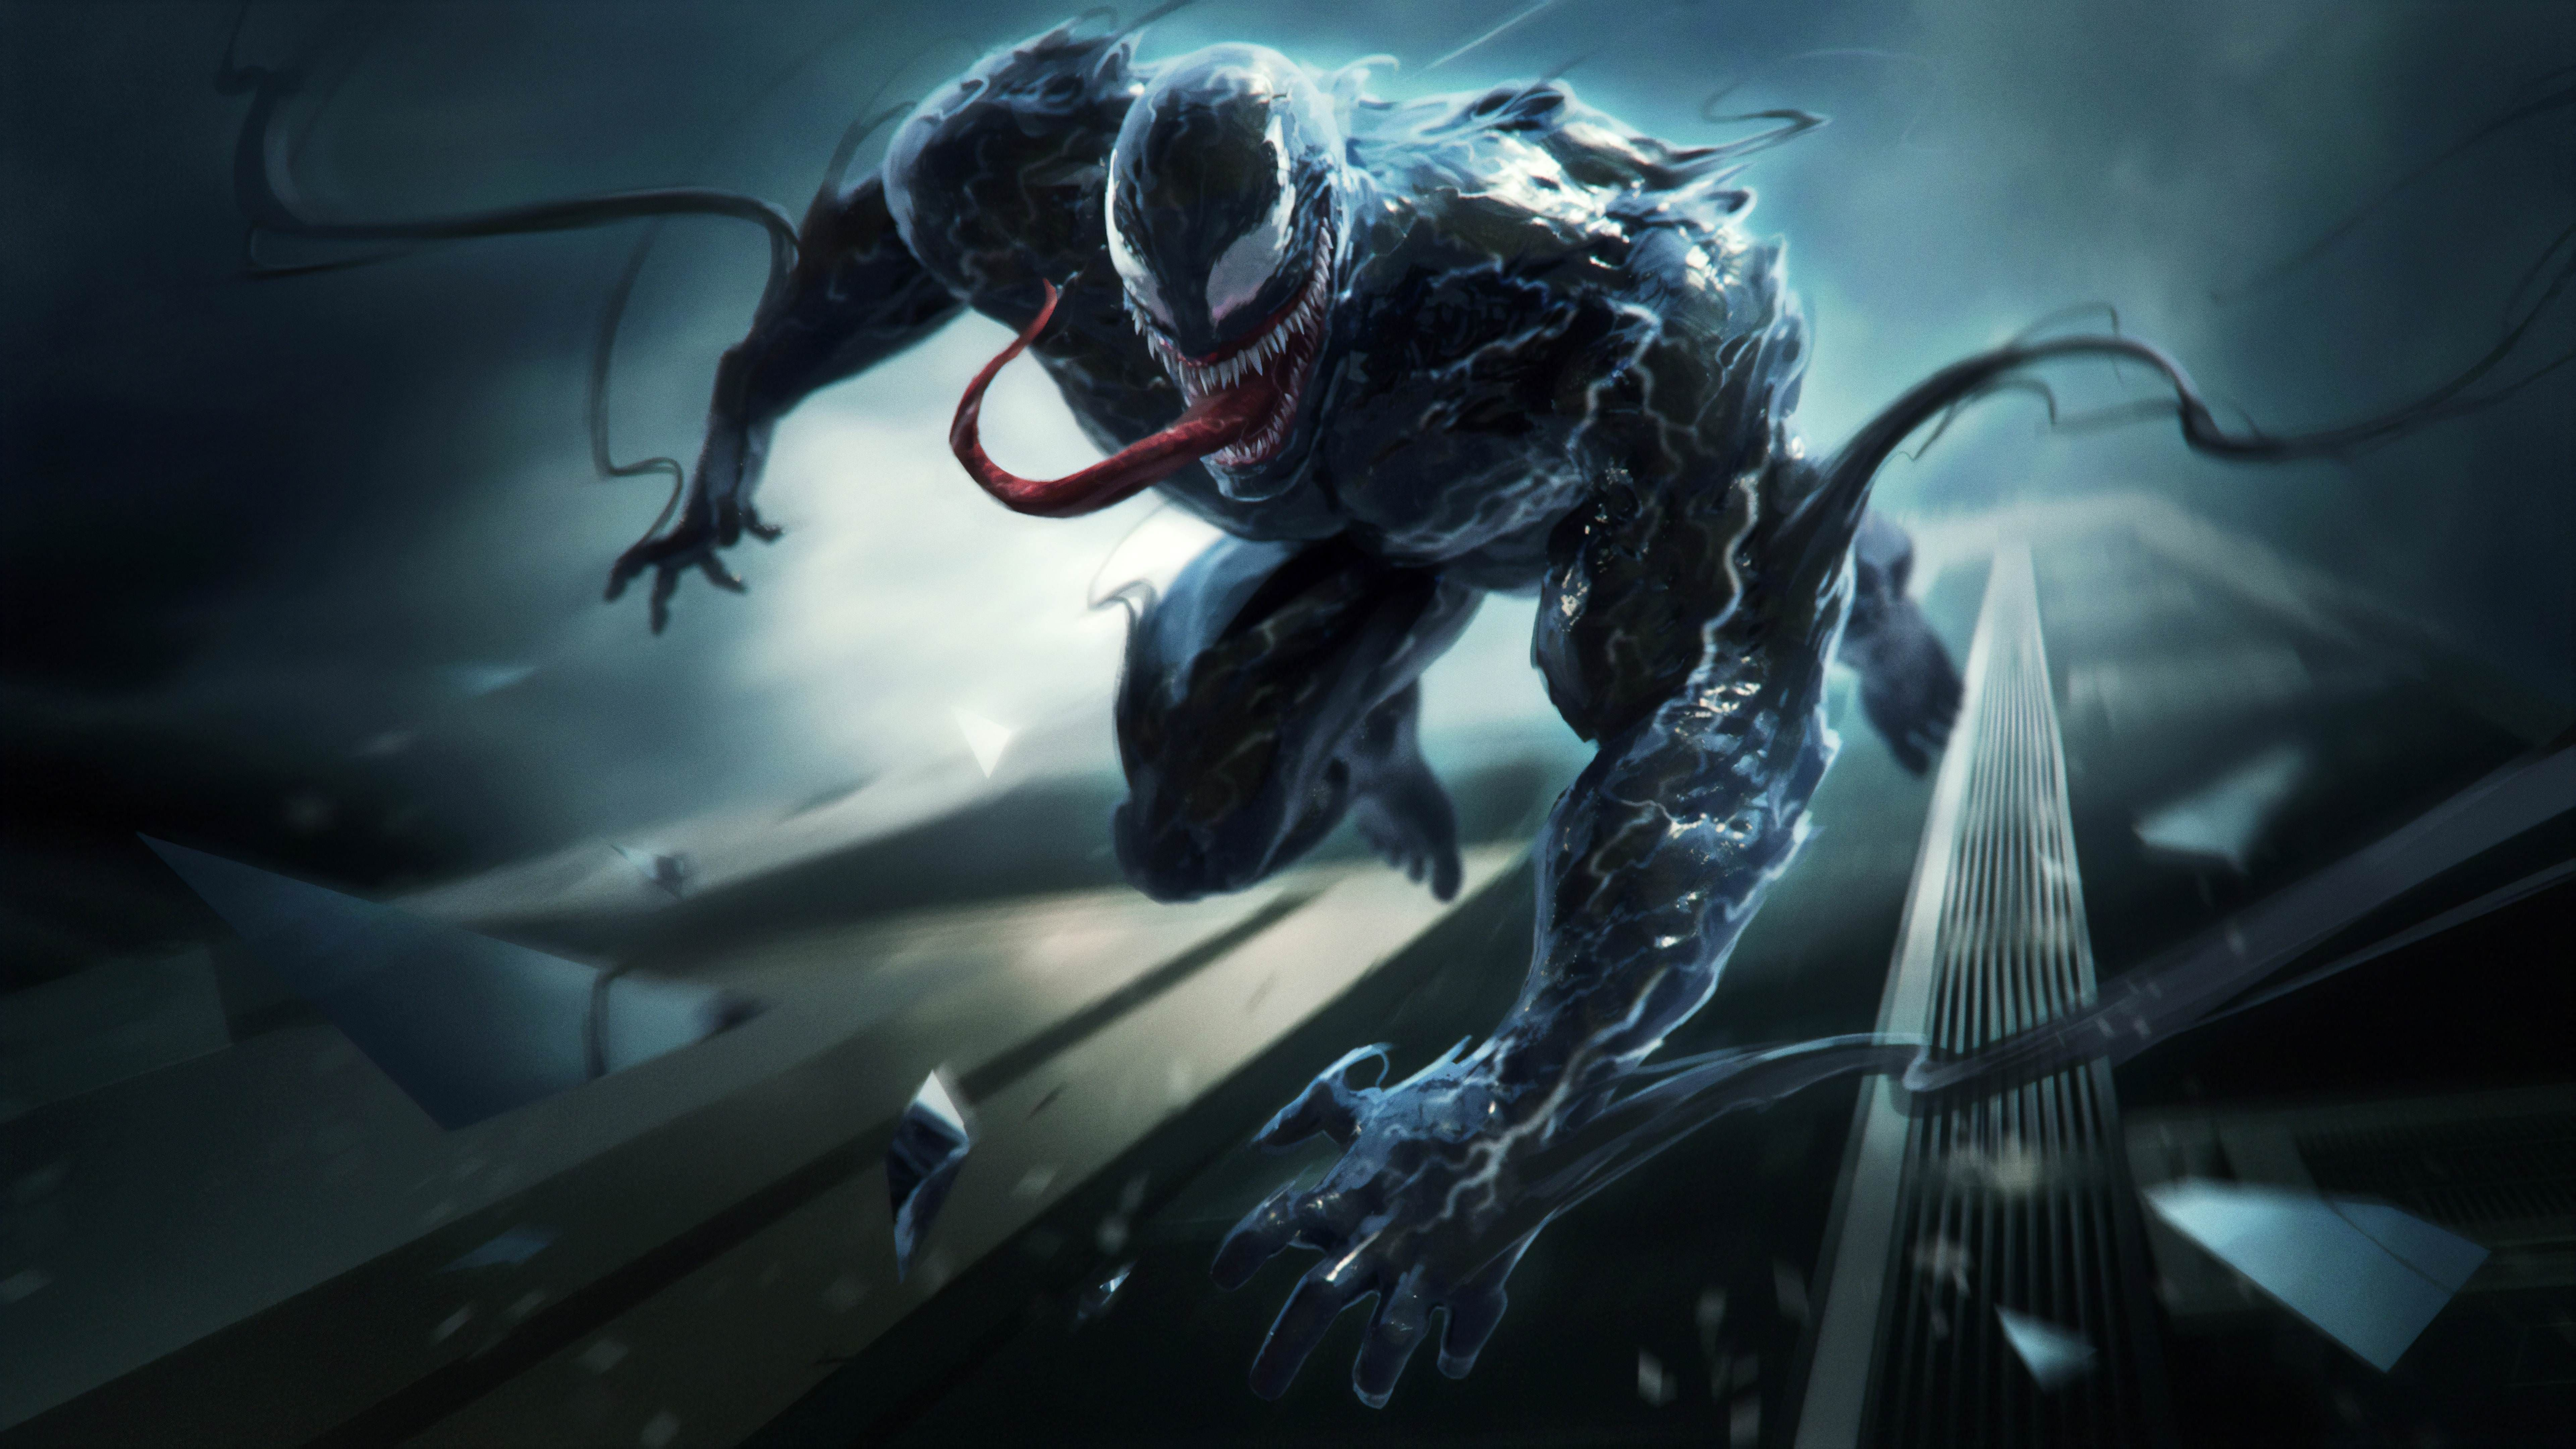 Venom [76804320] Hdwallpaper wallpaper image Marvel